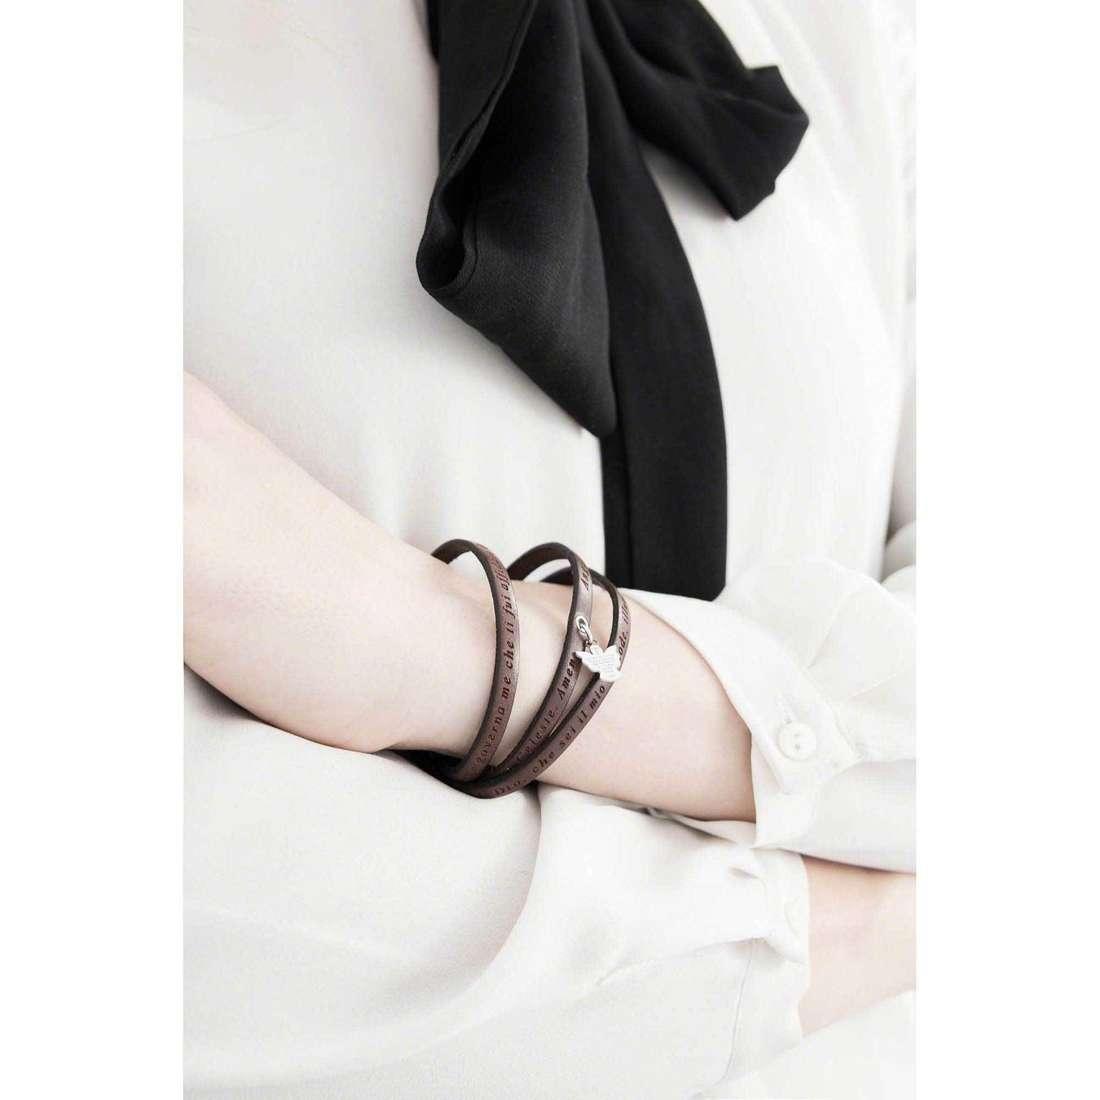 Amen bracelets Angelo di Dio femme AS-ADIT05-54 indosso